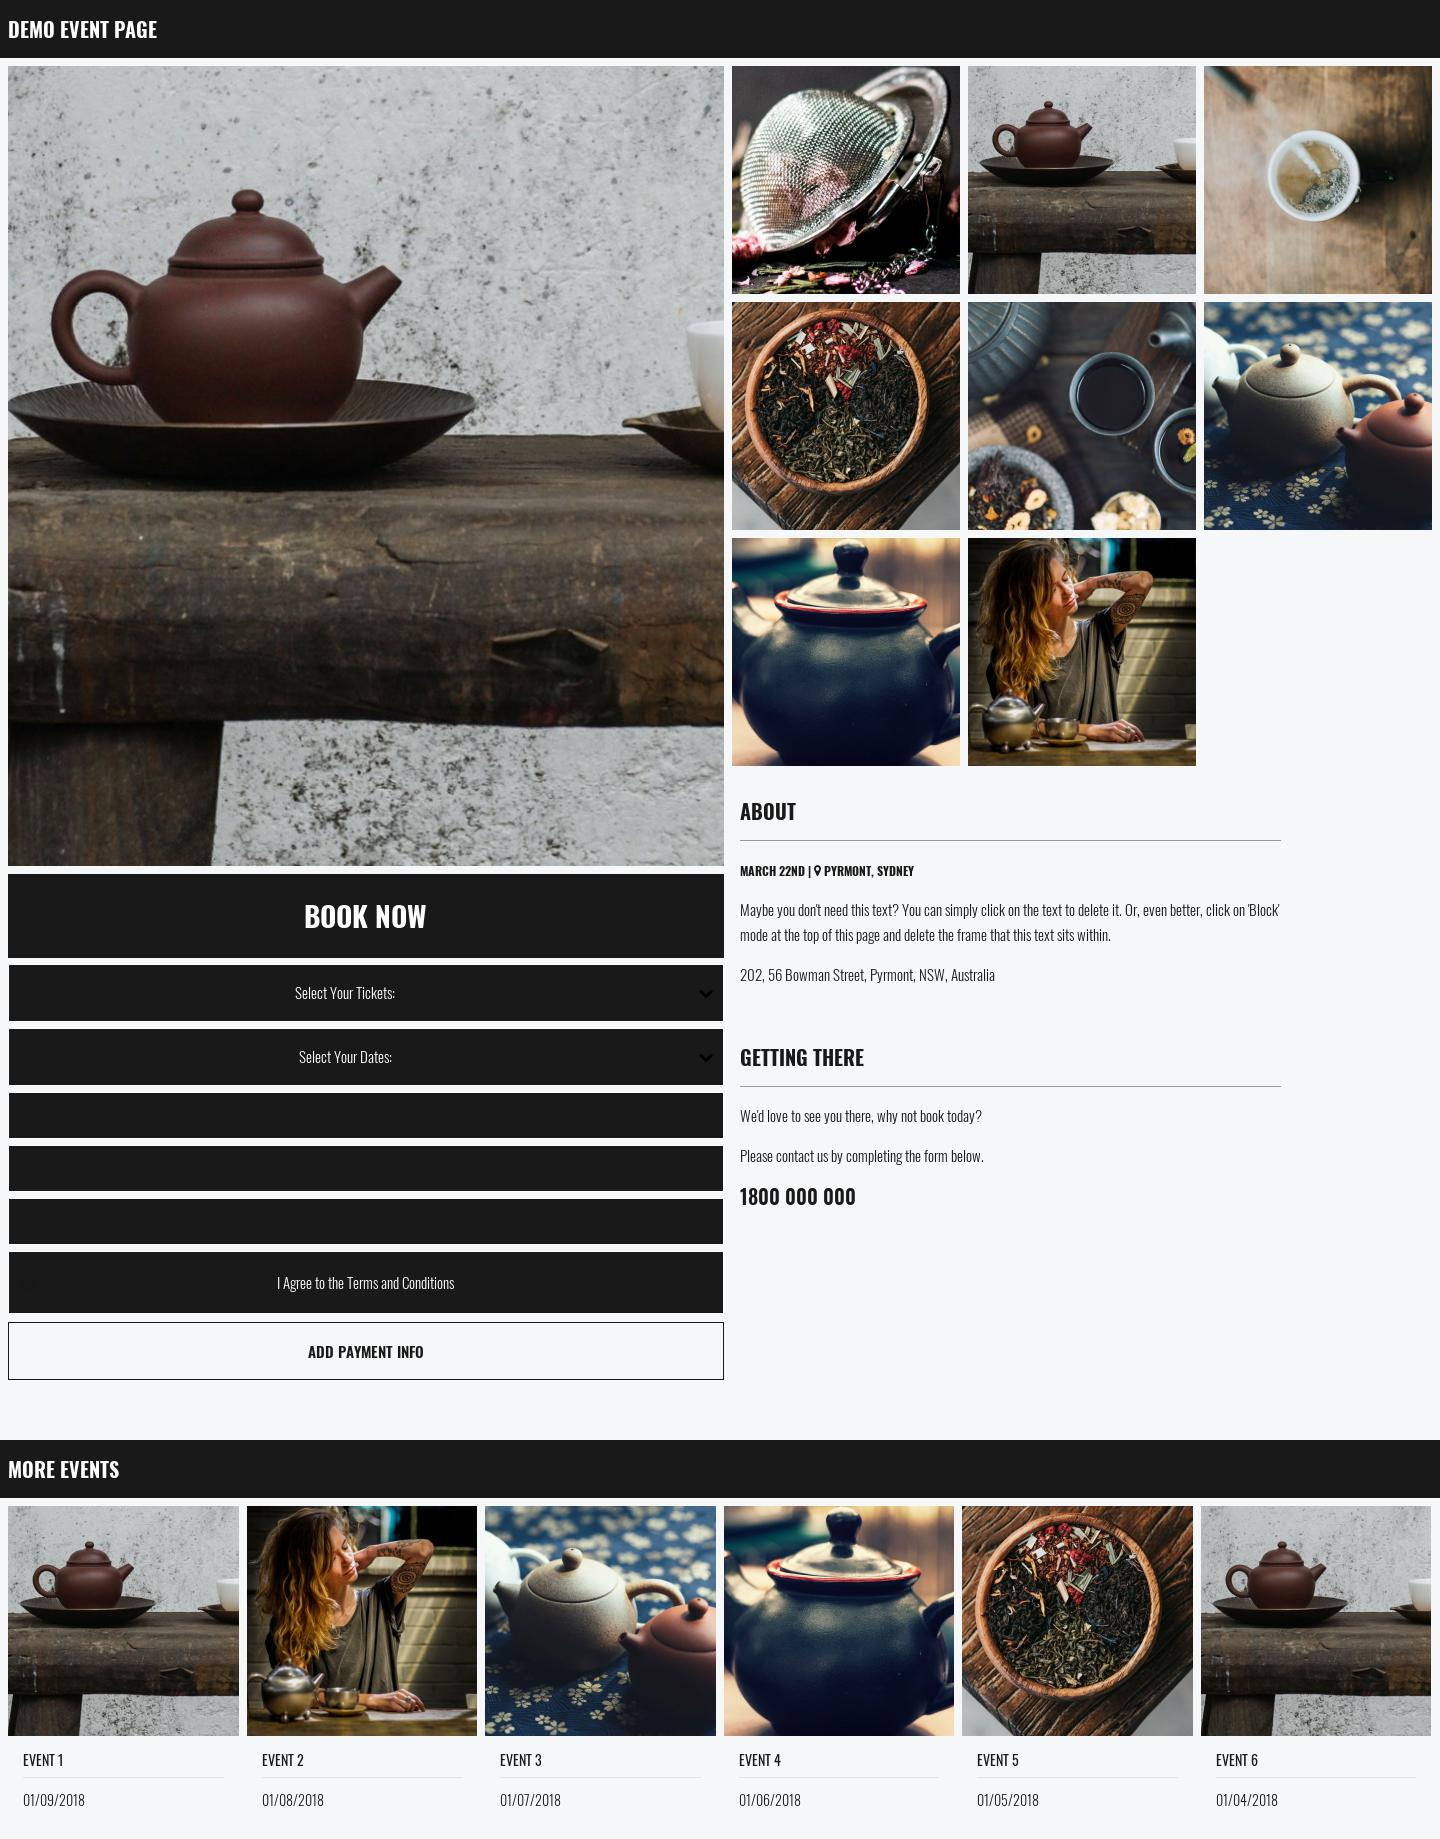 Rupie Event Page